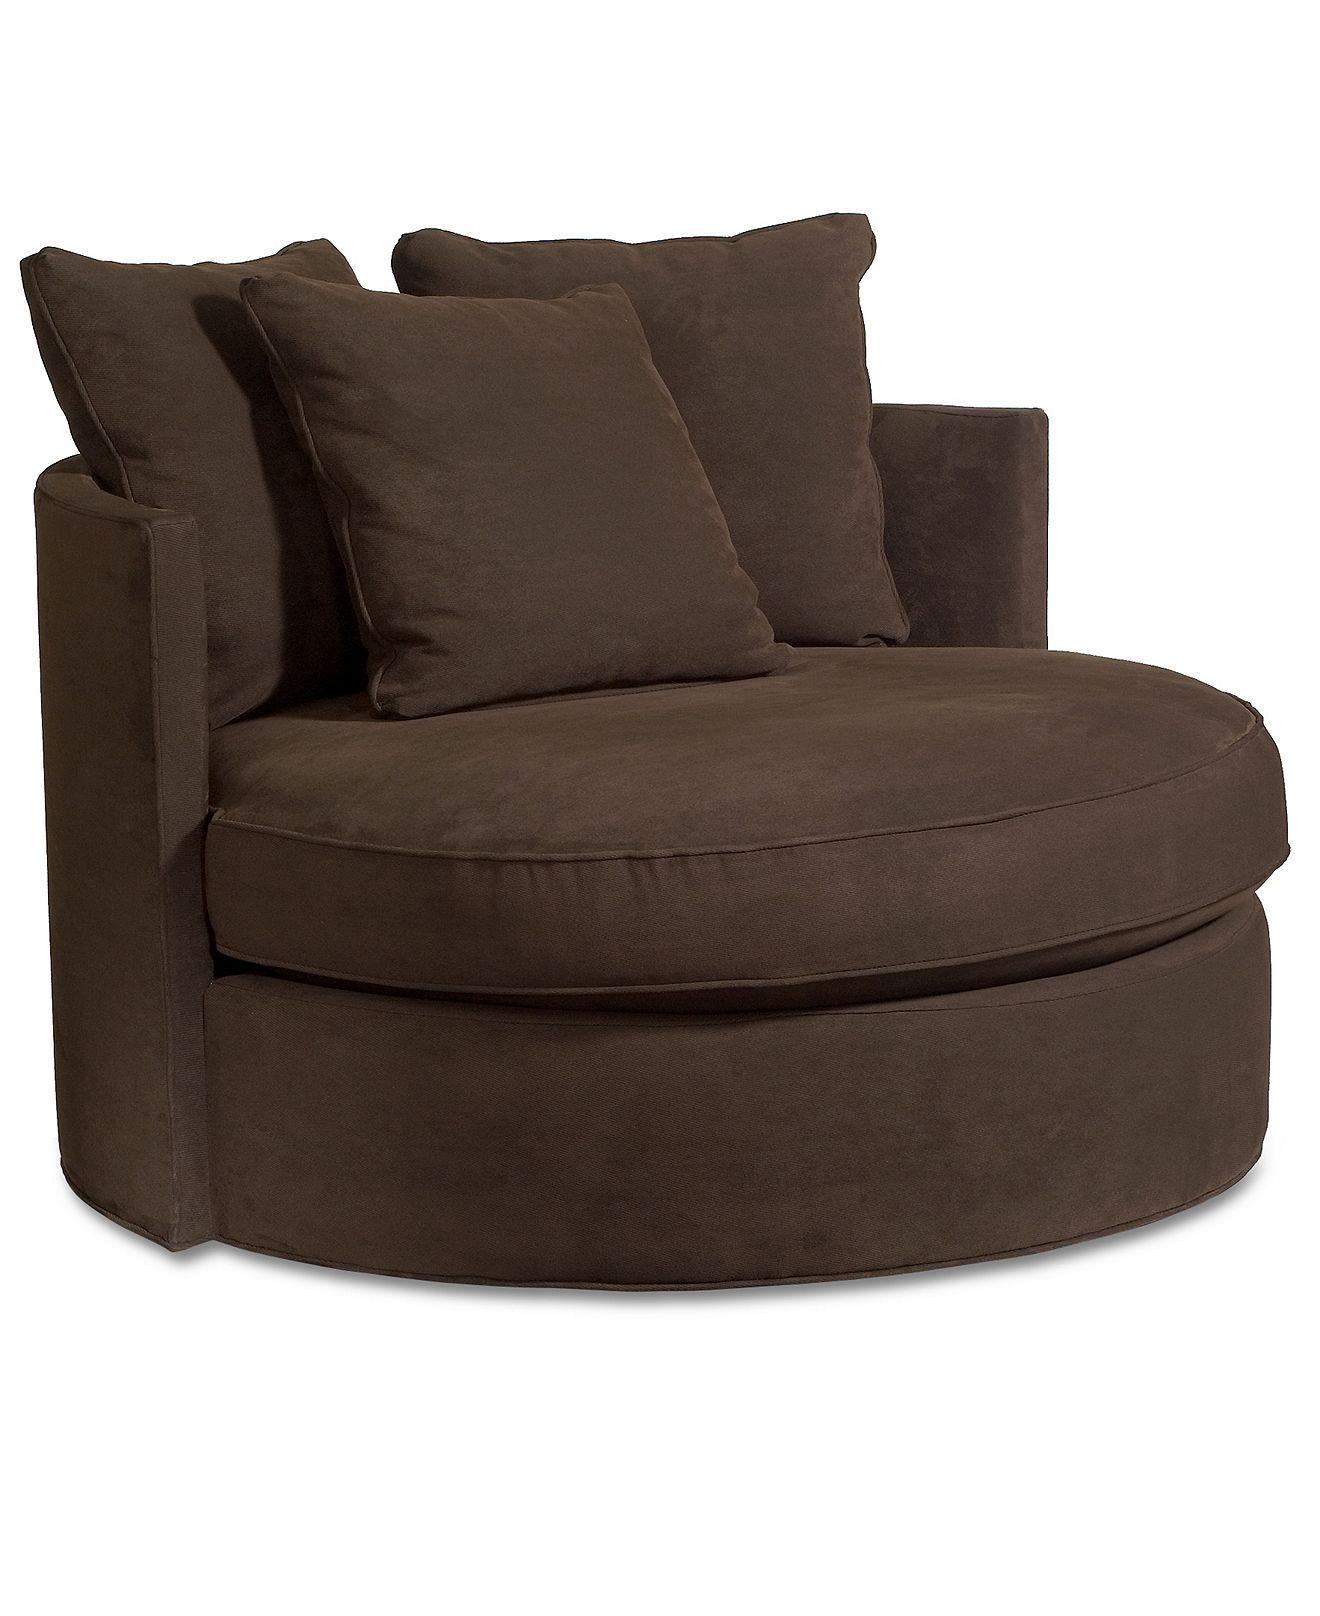 Cuddle Chair Doss Godiva Fabric Microfiber Living Room